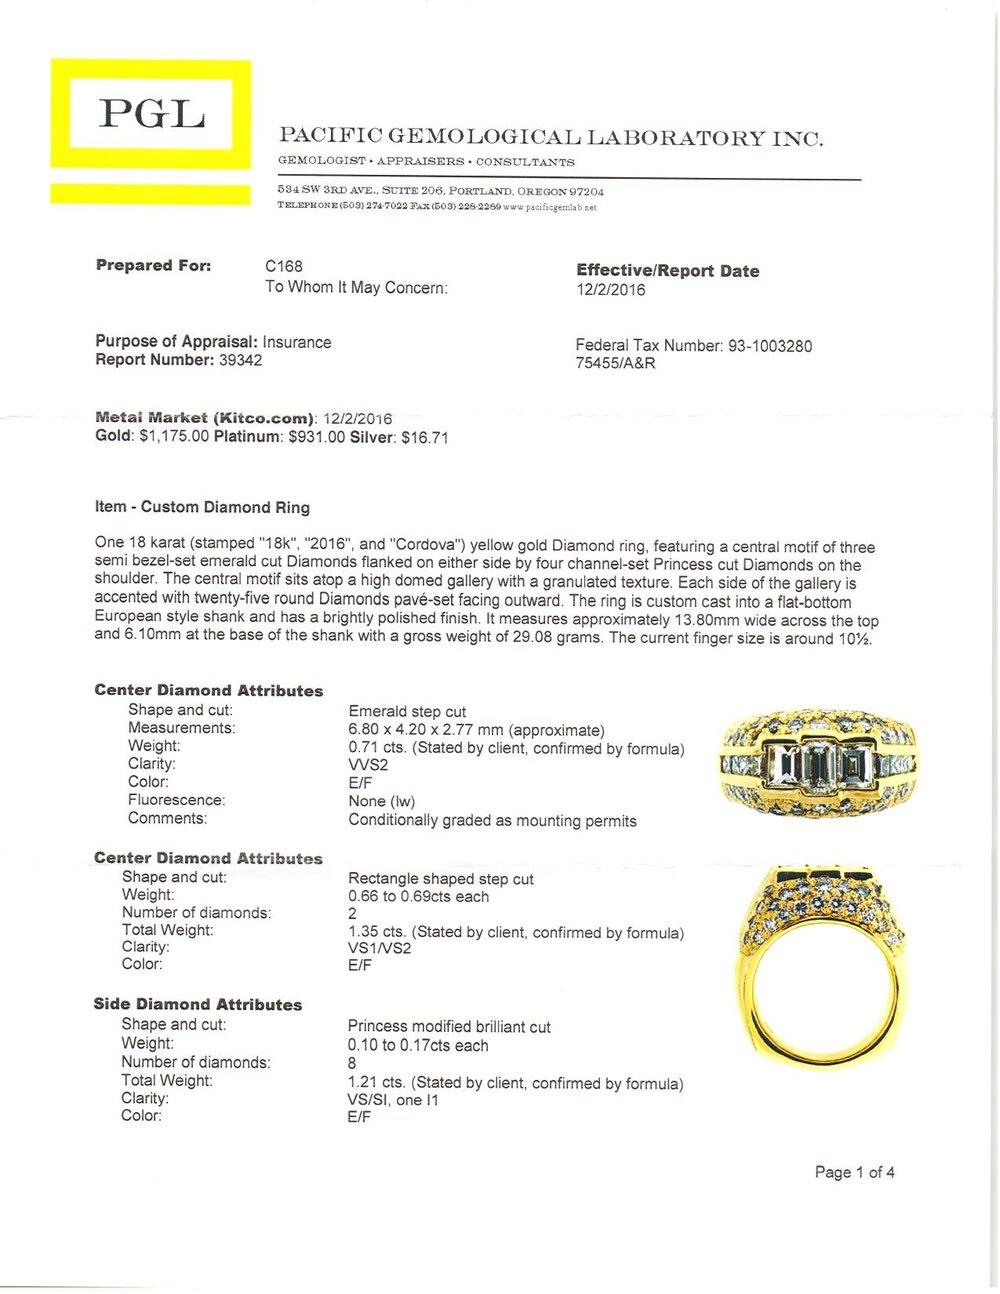 18k yellow gold and diamond mens ring appraisal.jpg